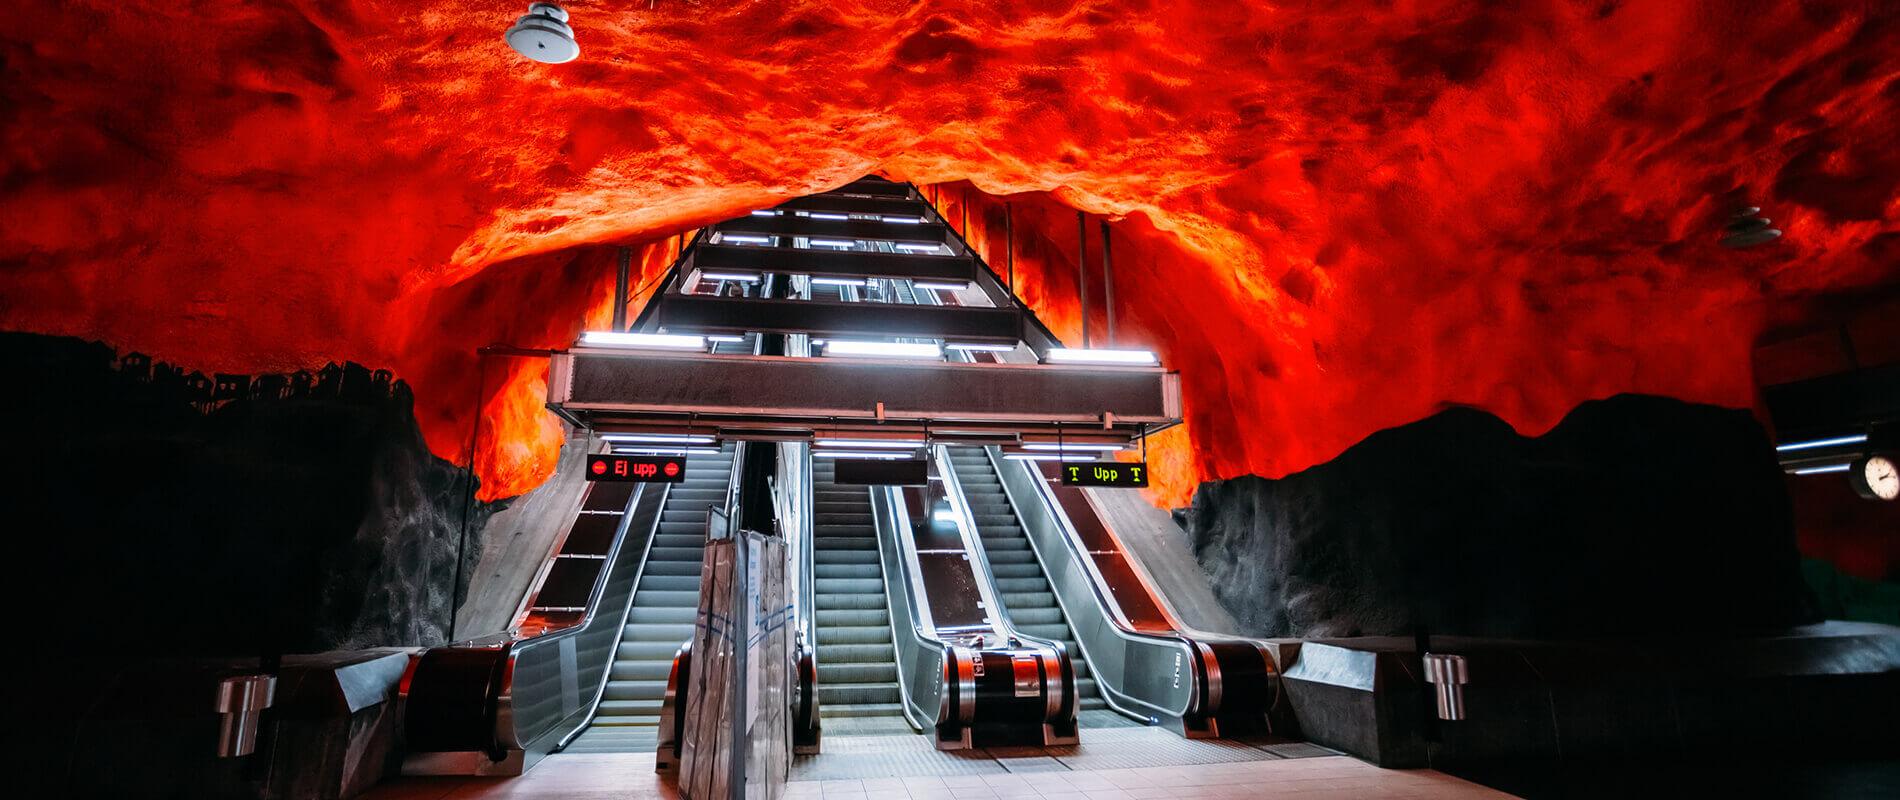 Tunnelbana, la splendida metropolitana di Stoccolma